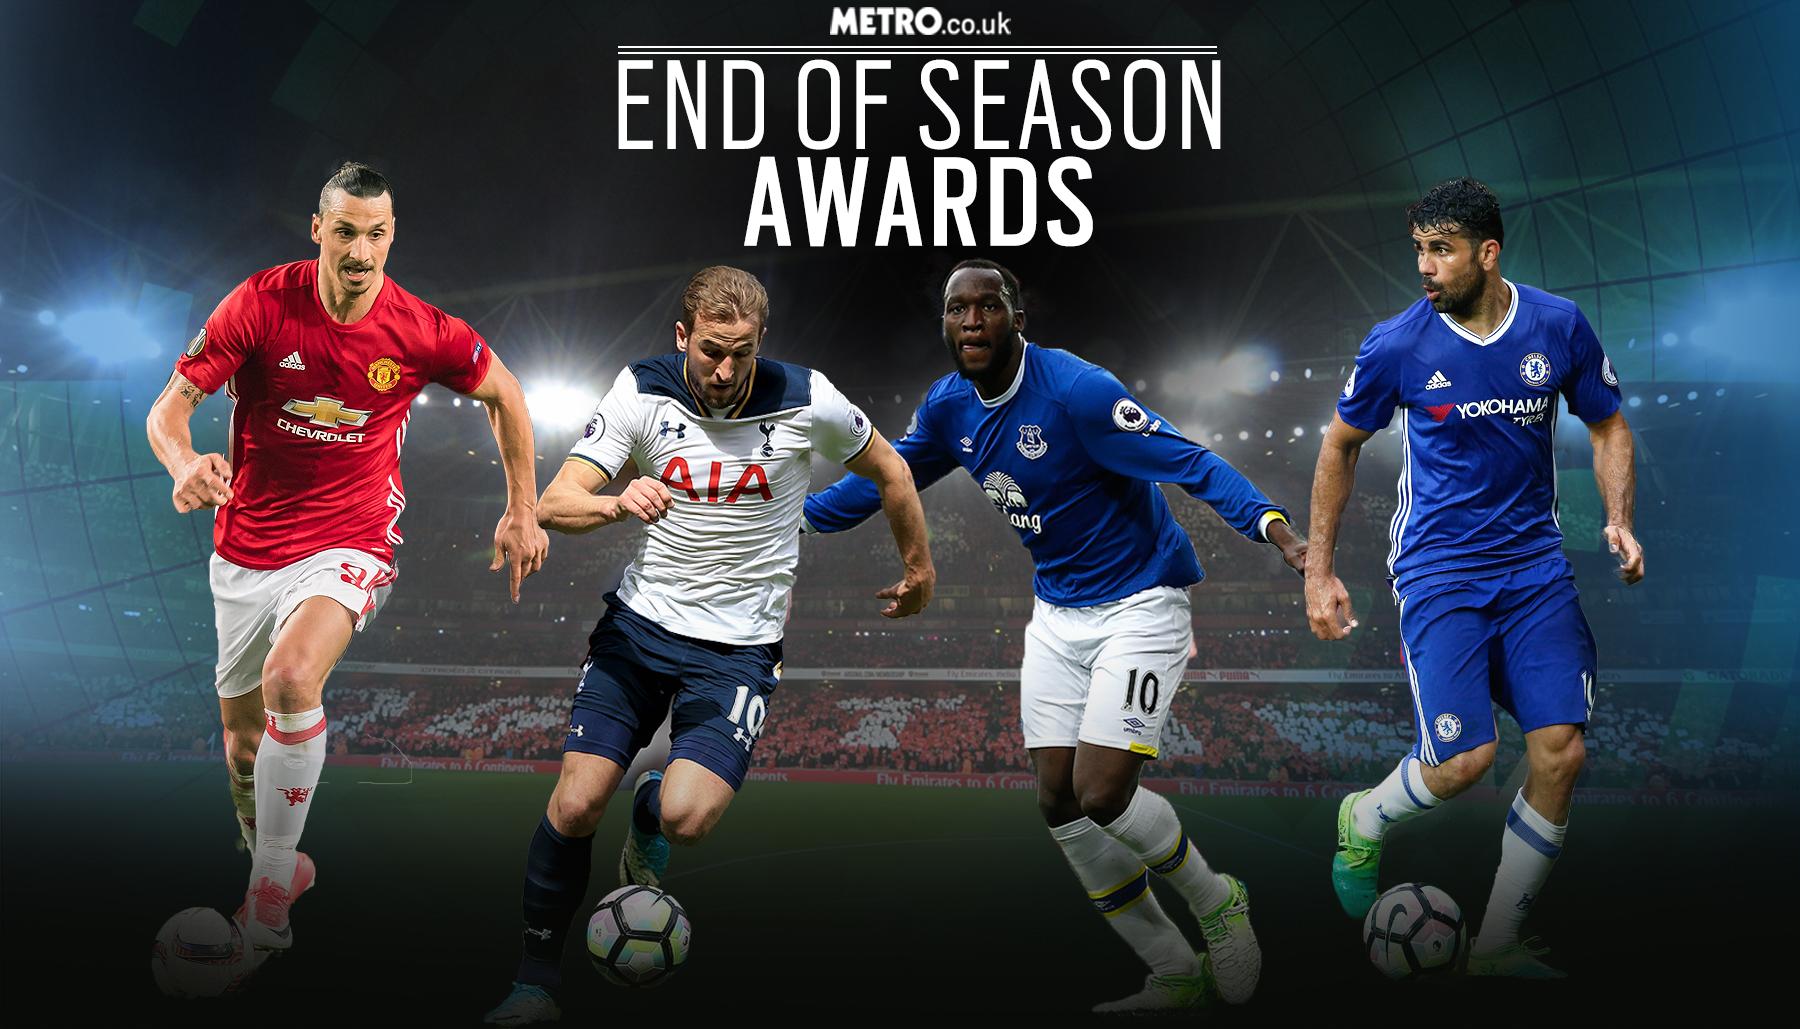 The 10 best Premier League strikers of the season